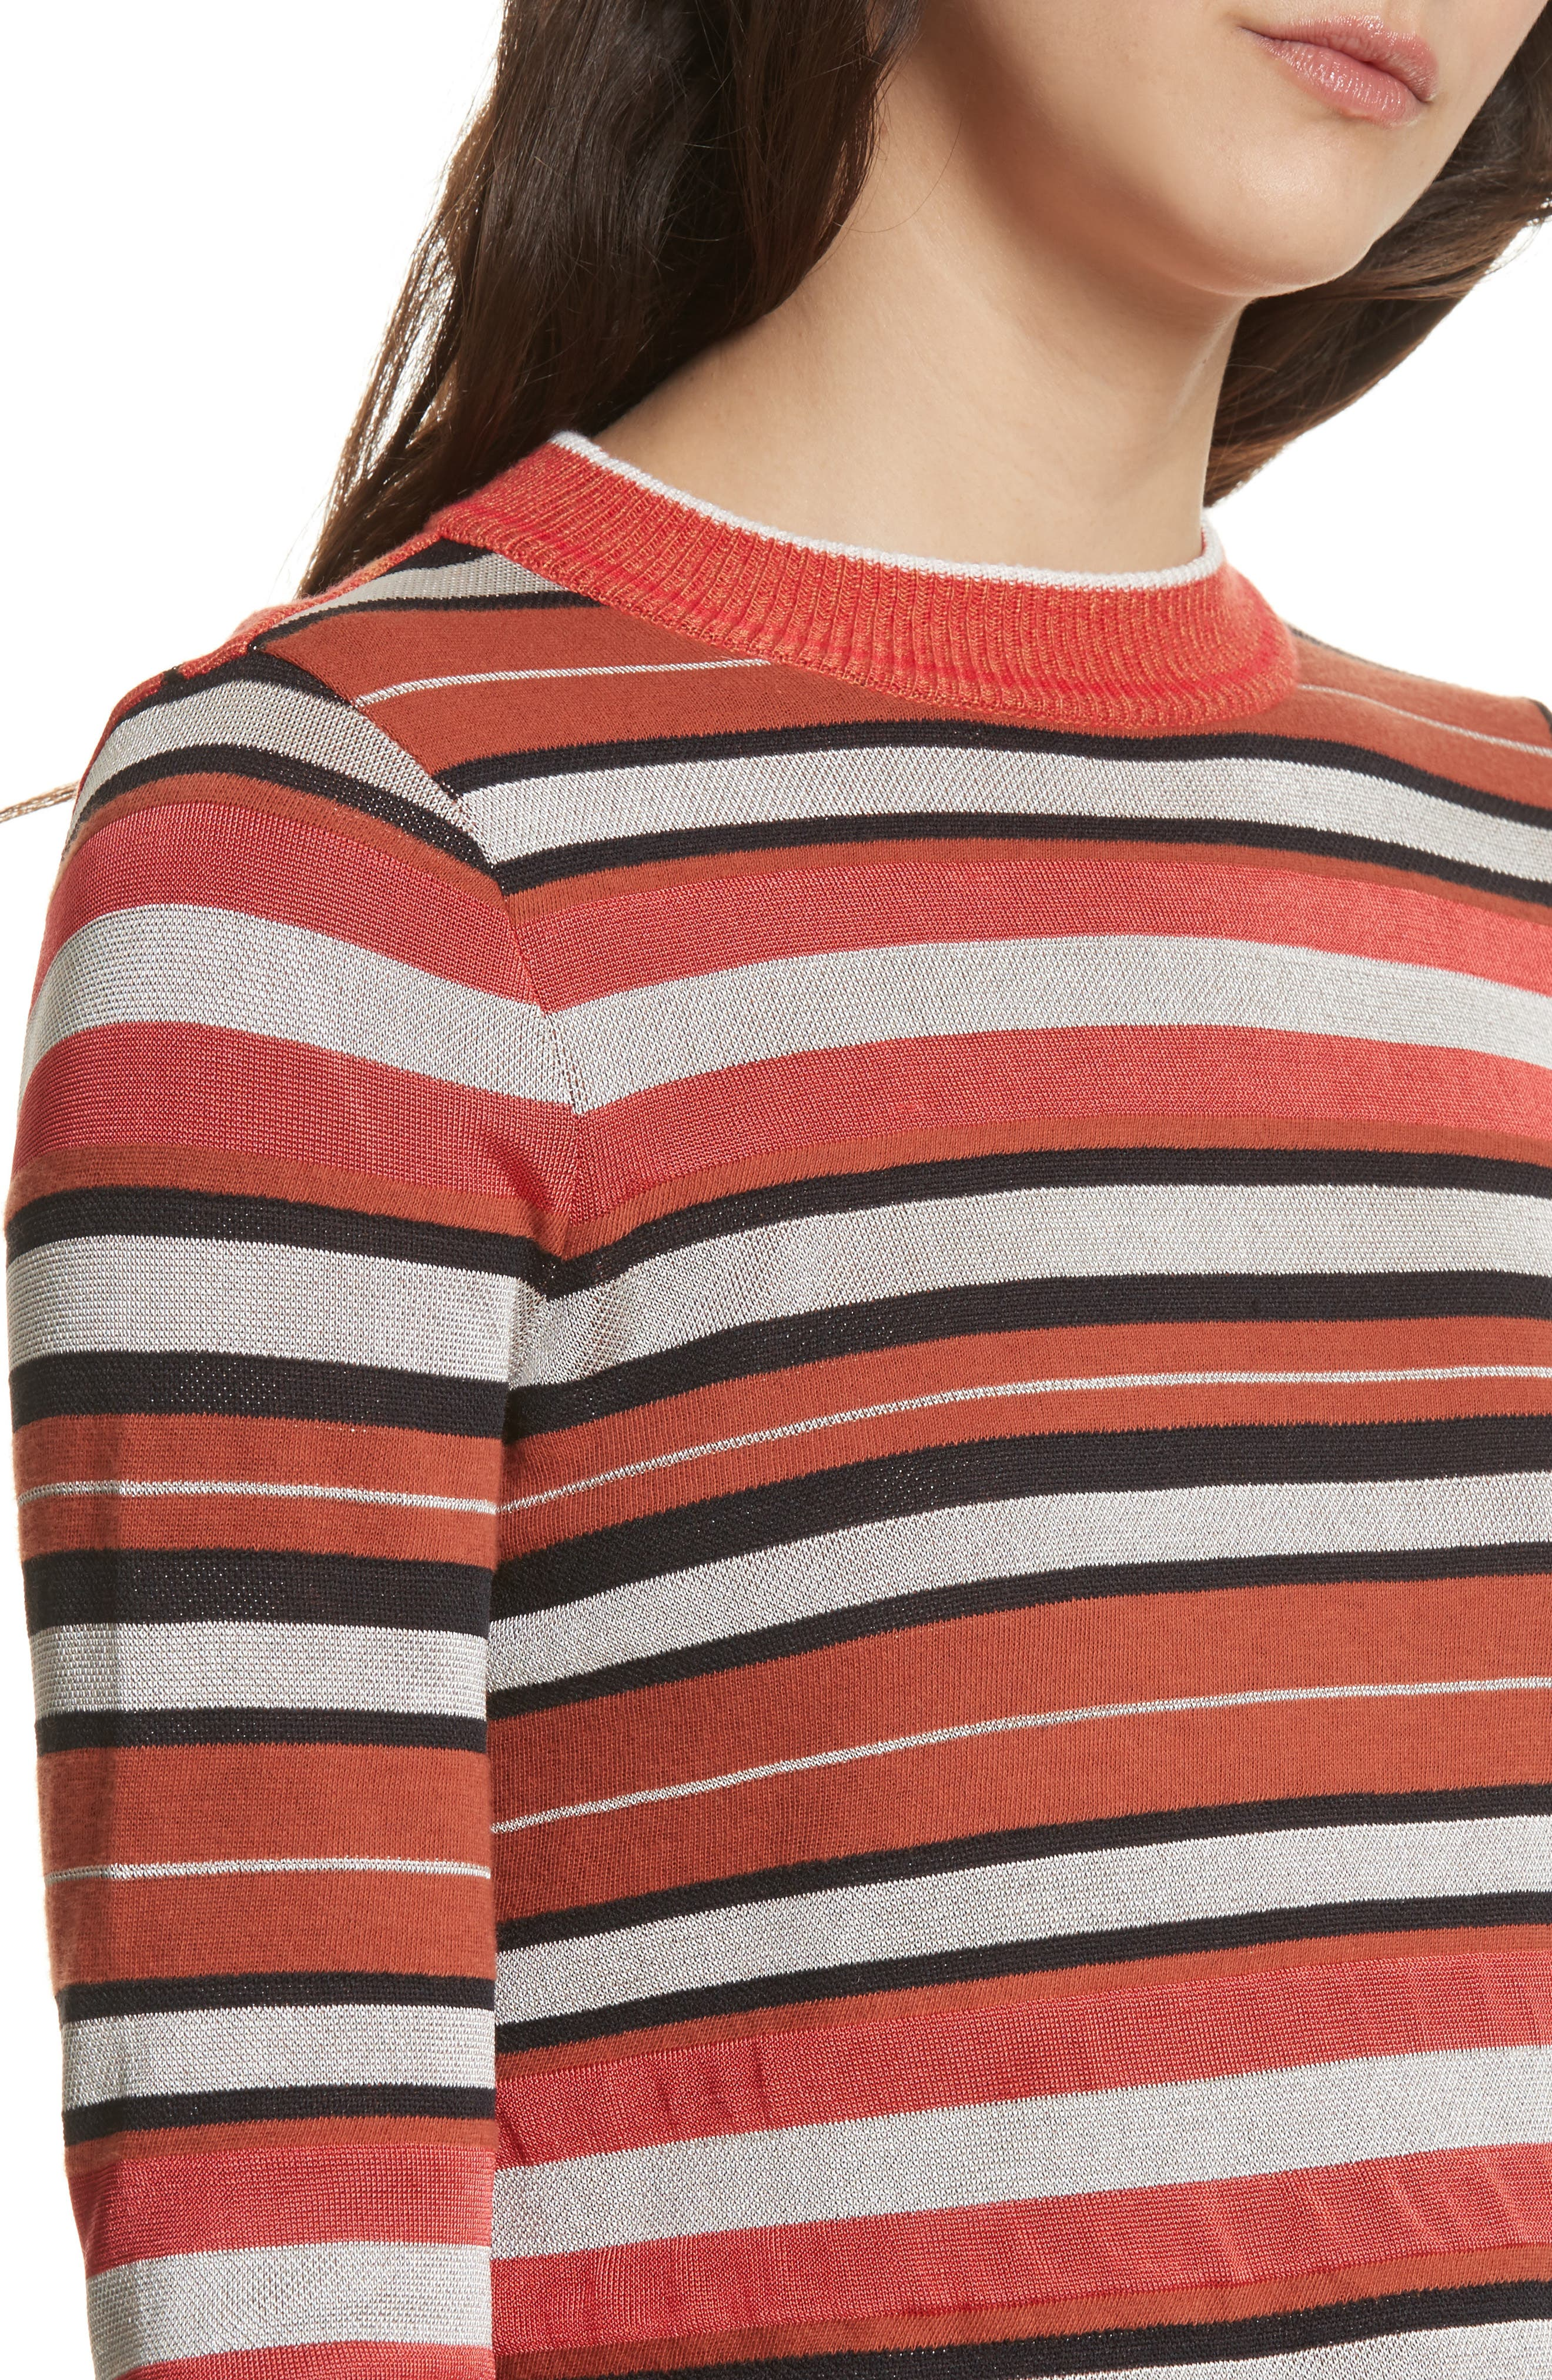 New Age Crewneck Sweater,                             Alternate thumbnail 10, color,